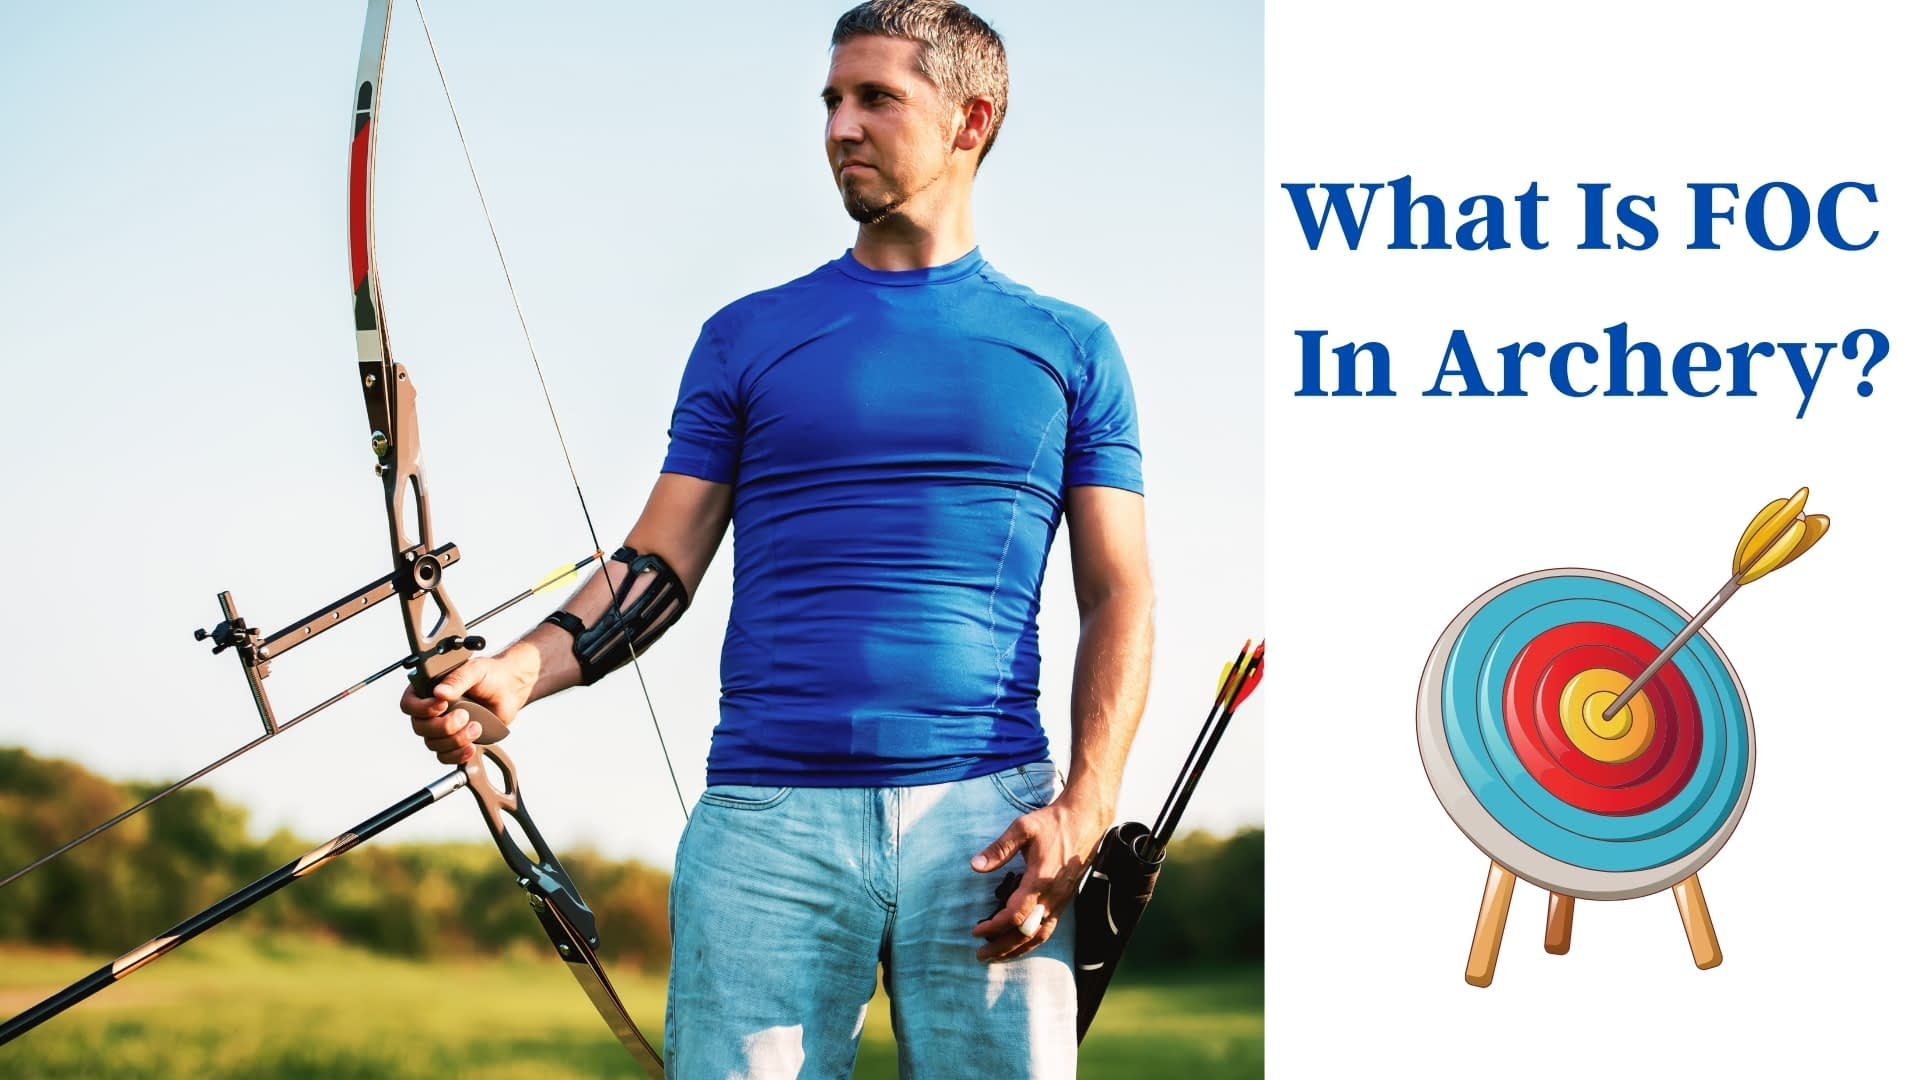 What is FOC In Archery